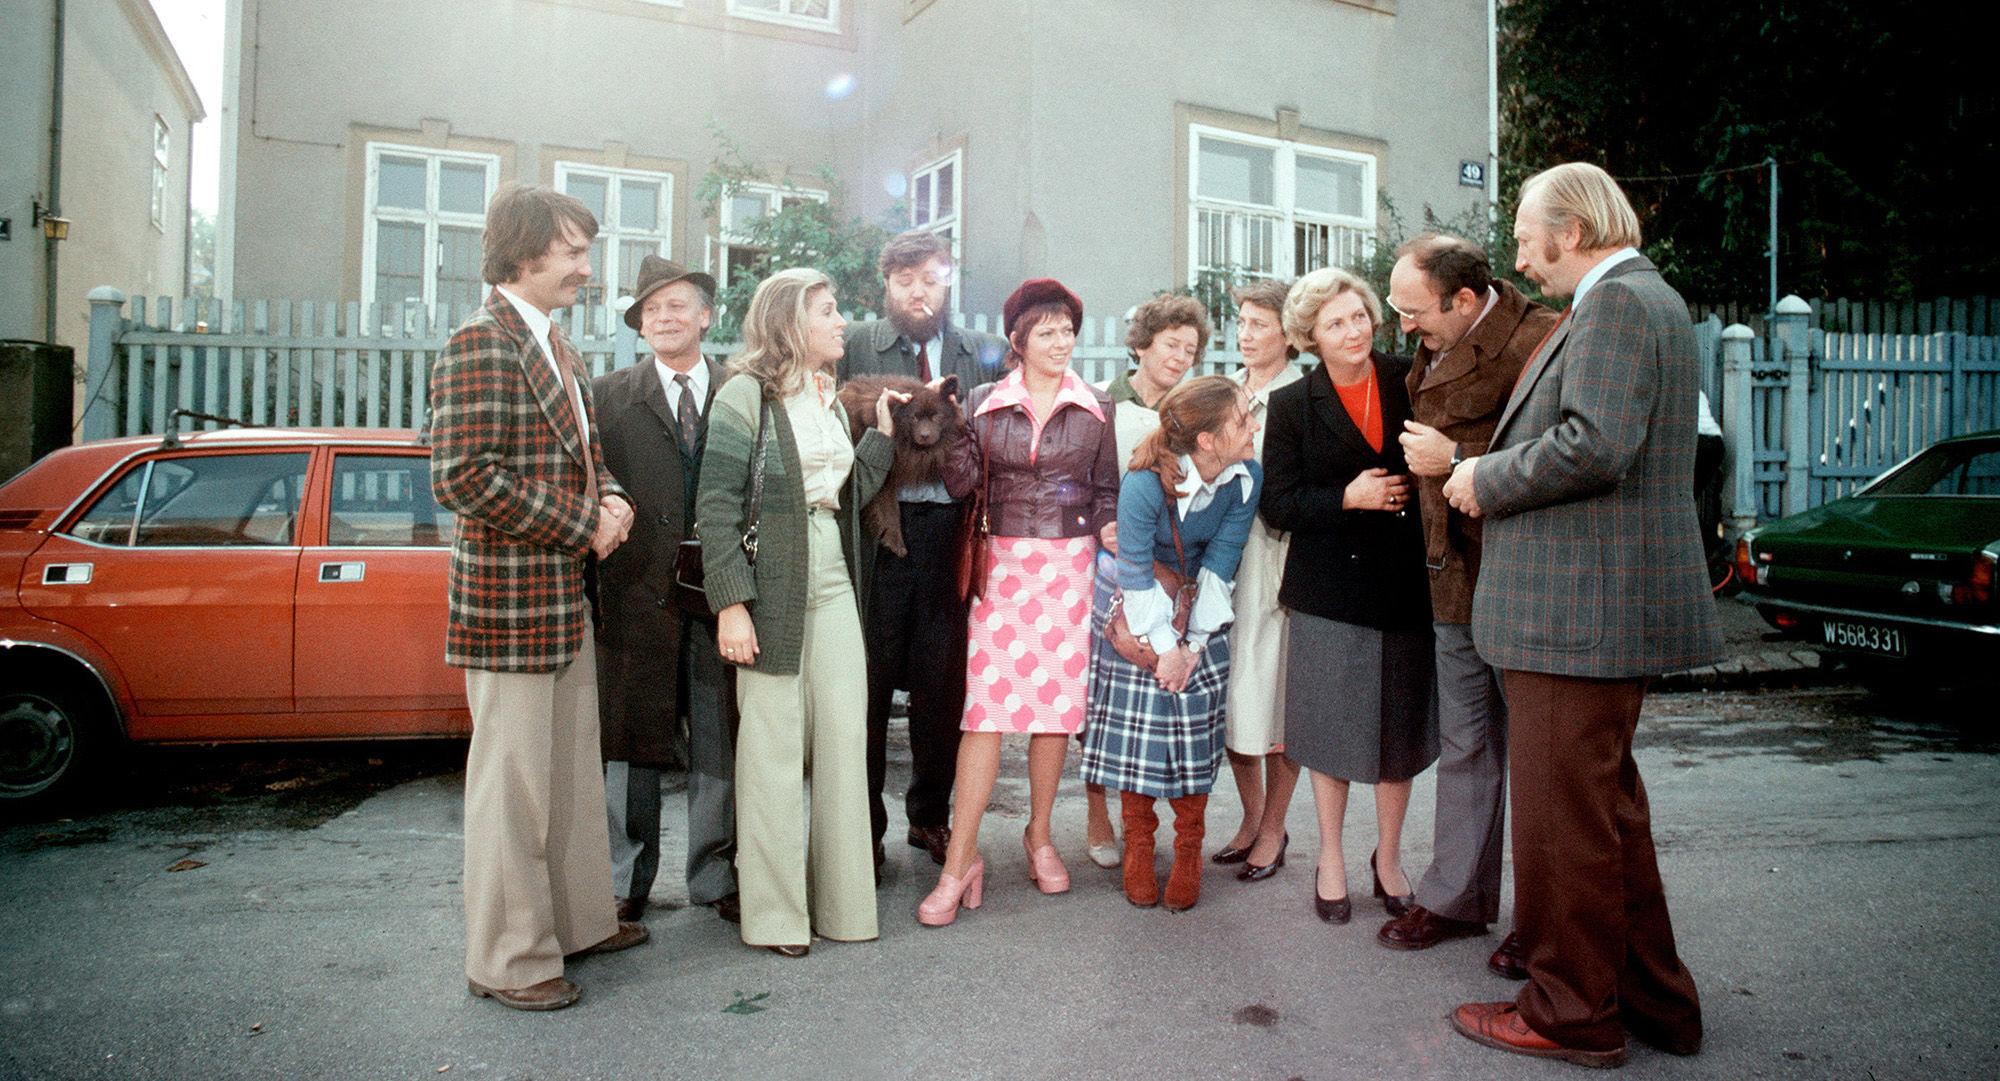 Karli (Klaus Rott), Schani Onkel (Rudi Schippel), Irmi (Liliana Nelska), Kurti (Götz Kauffmann), Fini (Dolores Schmiedinger), Frau Vejvoda (Julia Gschnitzer), Hanni (Erika Deutinger), Toni (Ingrid Buckhard), Martha Werner (Ilse Hanel), Herr Werner (Jorom